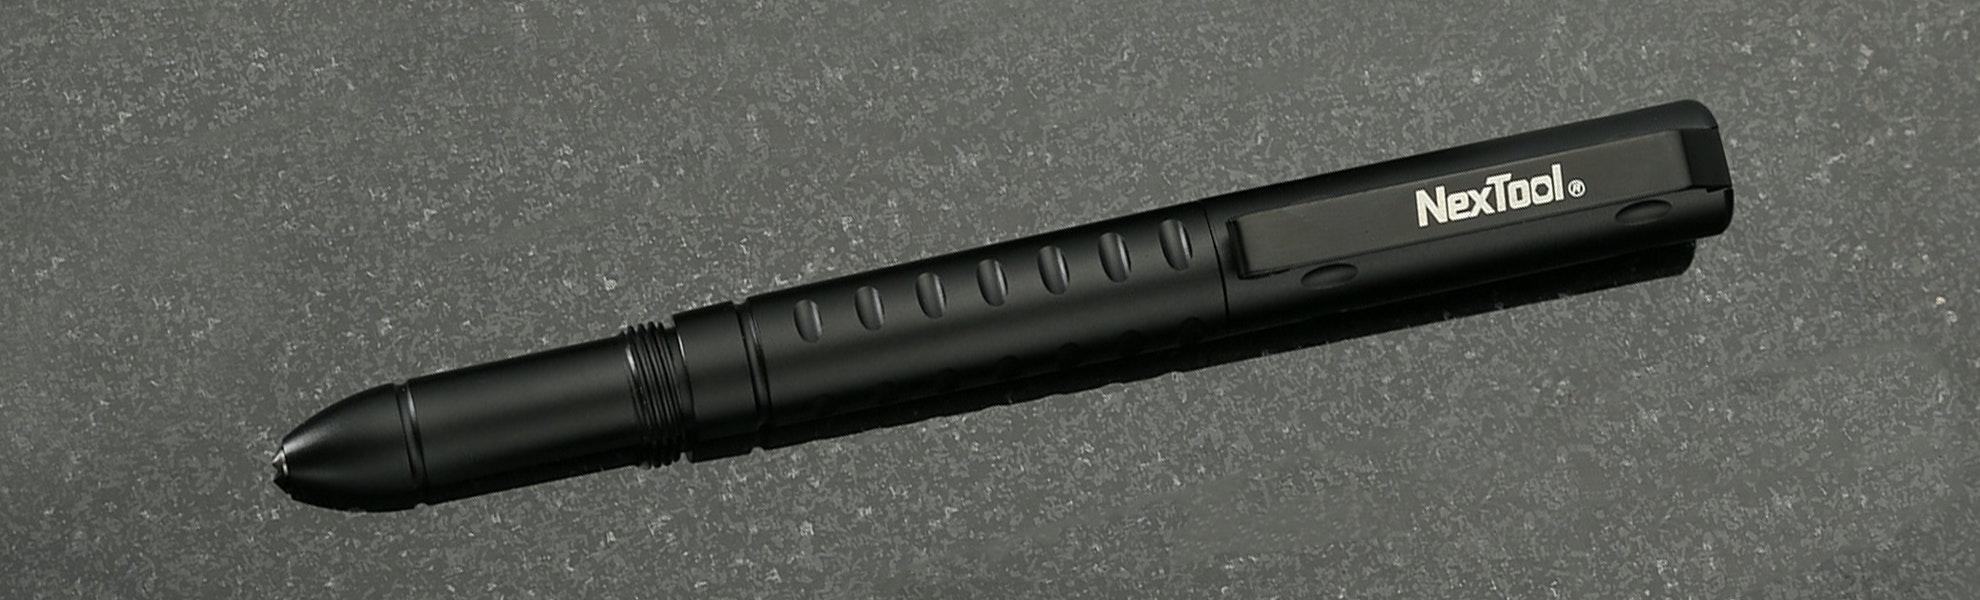 NexTool Tactical Pen w/Fisher Space Pen Cartridge